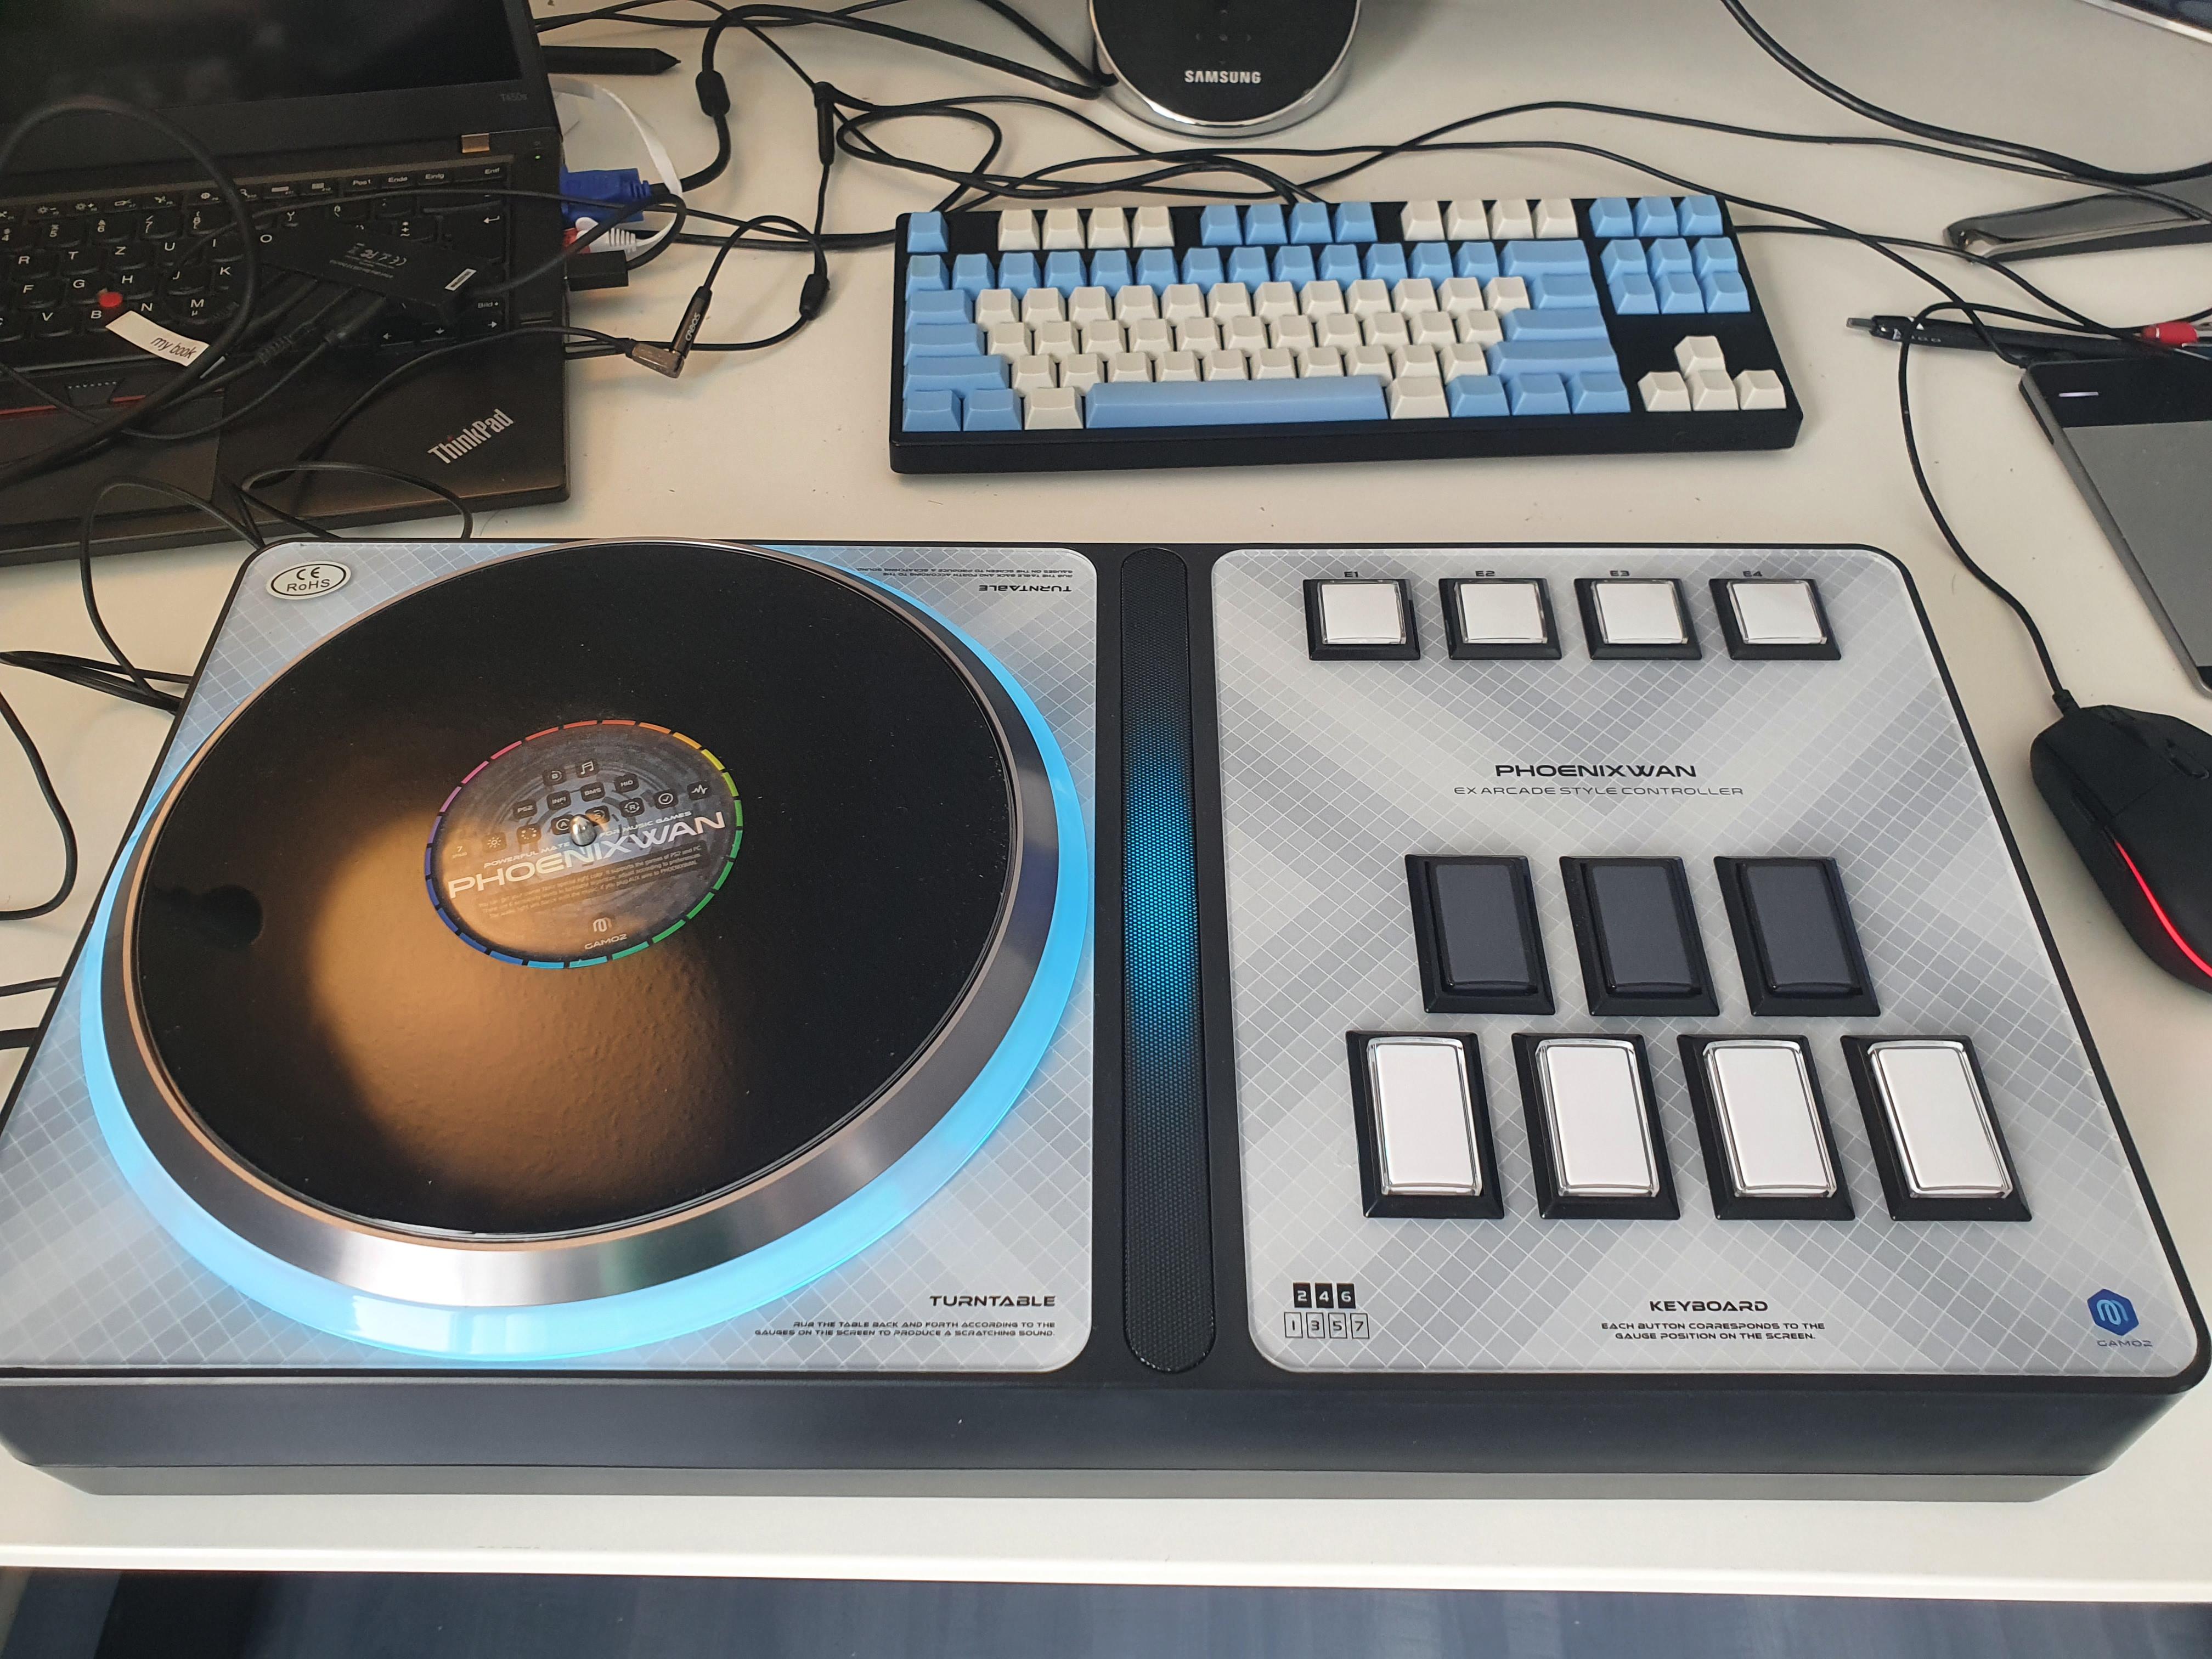 Arcade-style controller for beatmania IIDX